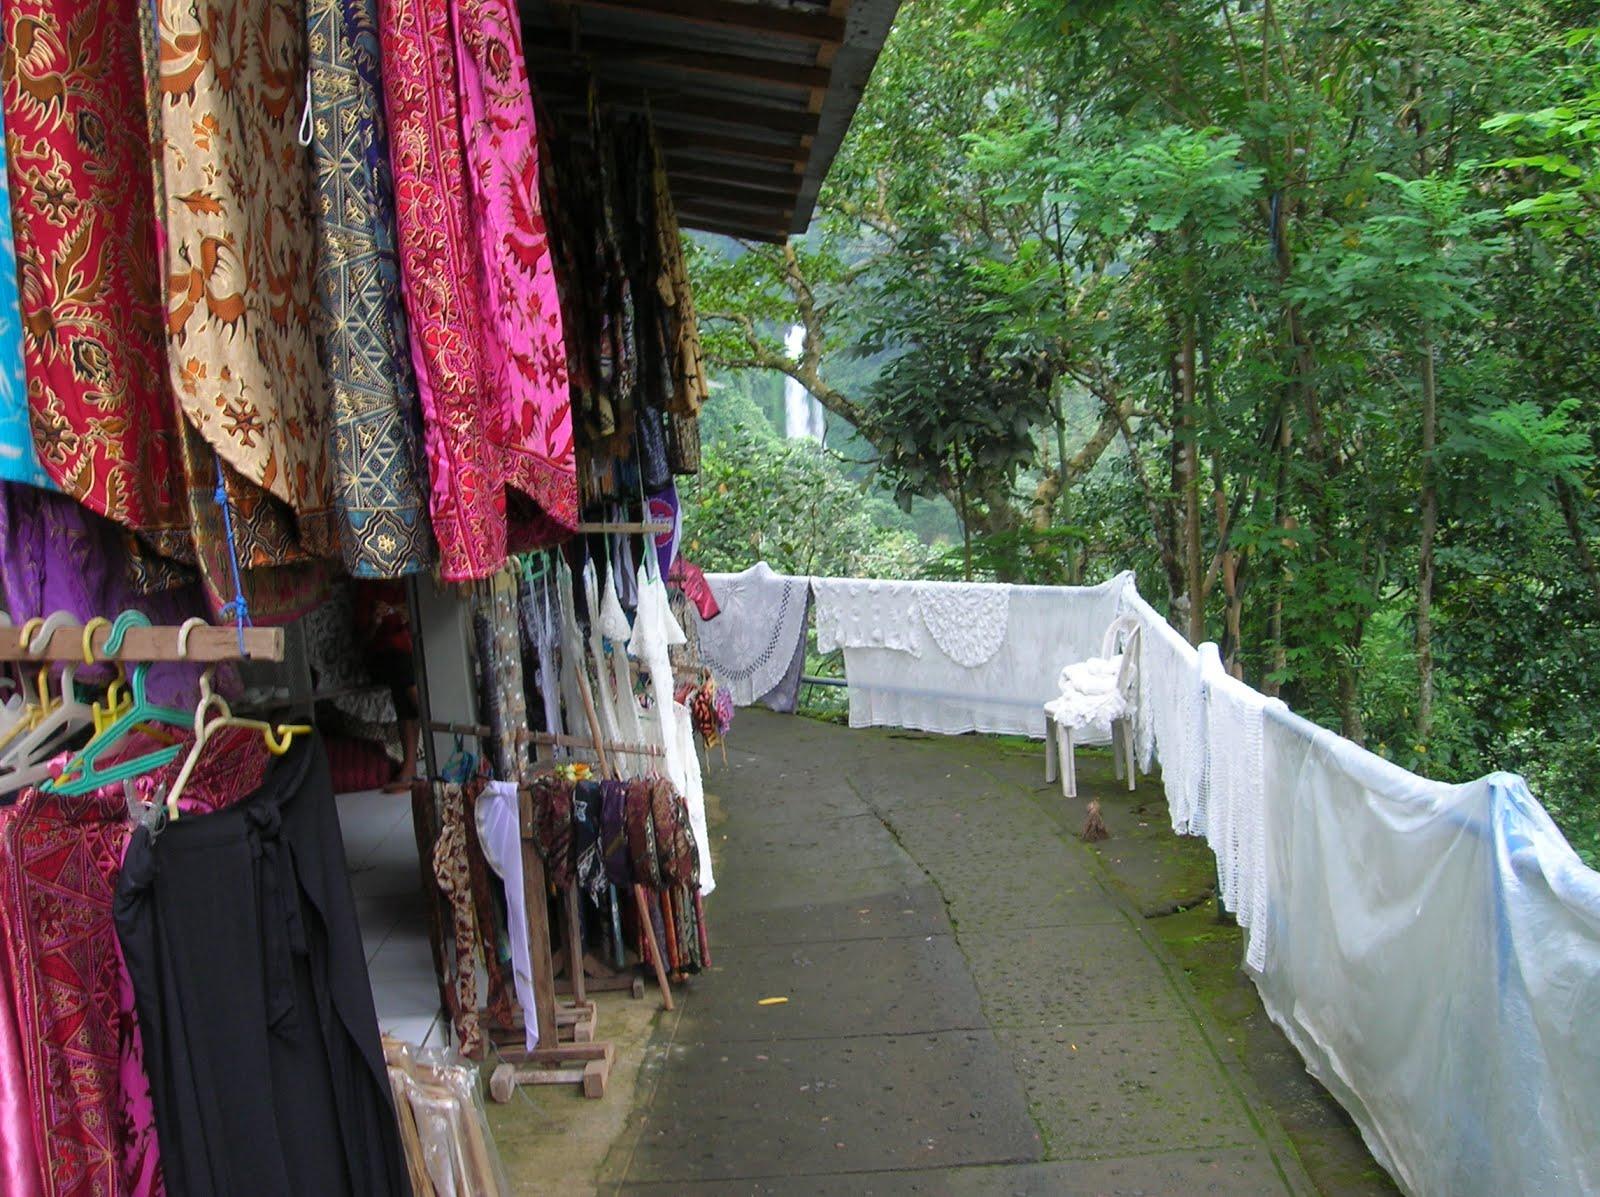 Tiendas en cascada Git Git, Isla de Bali,Indonesia, vuelta al mundo, round the world, La vuelta al mundo de Asun y Ricardo